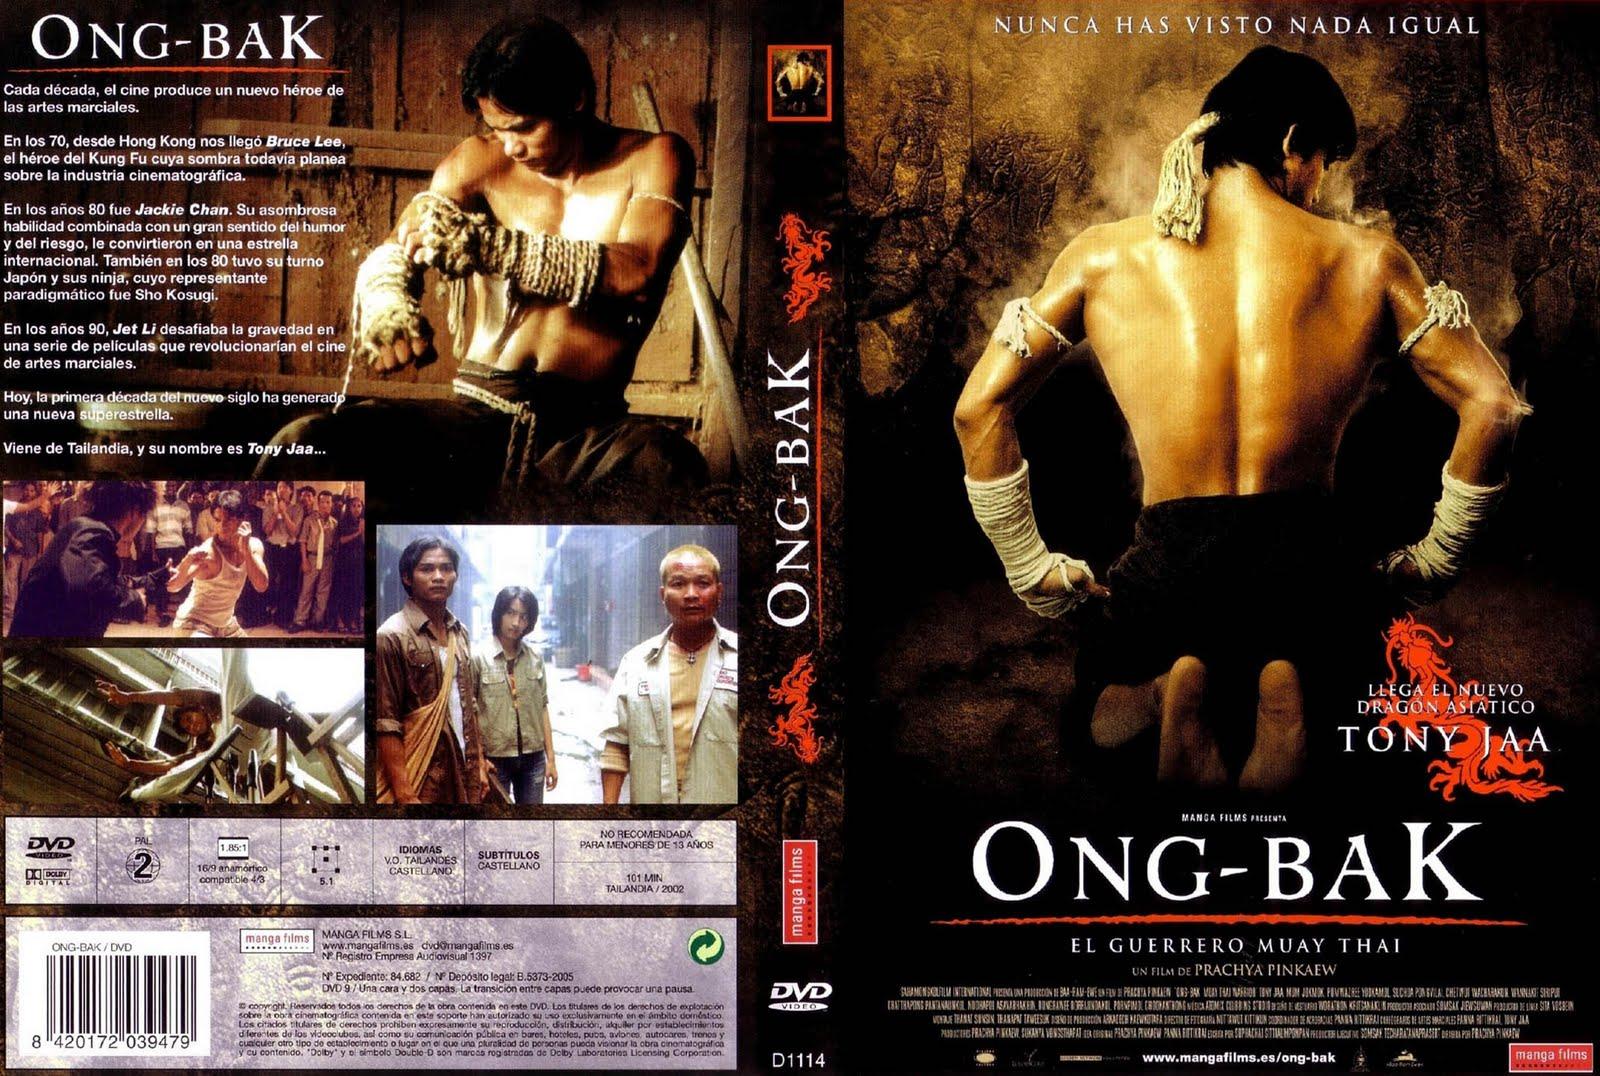 ong bak 2 full movie english subtitles free